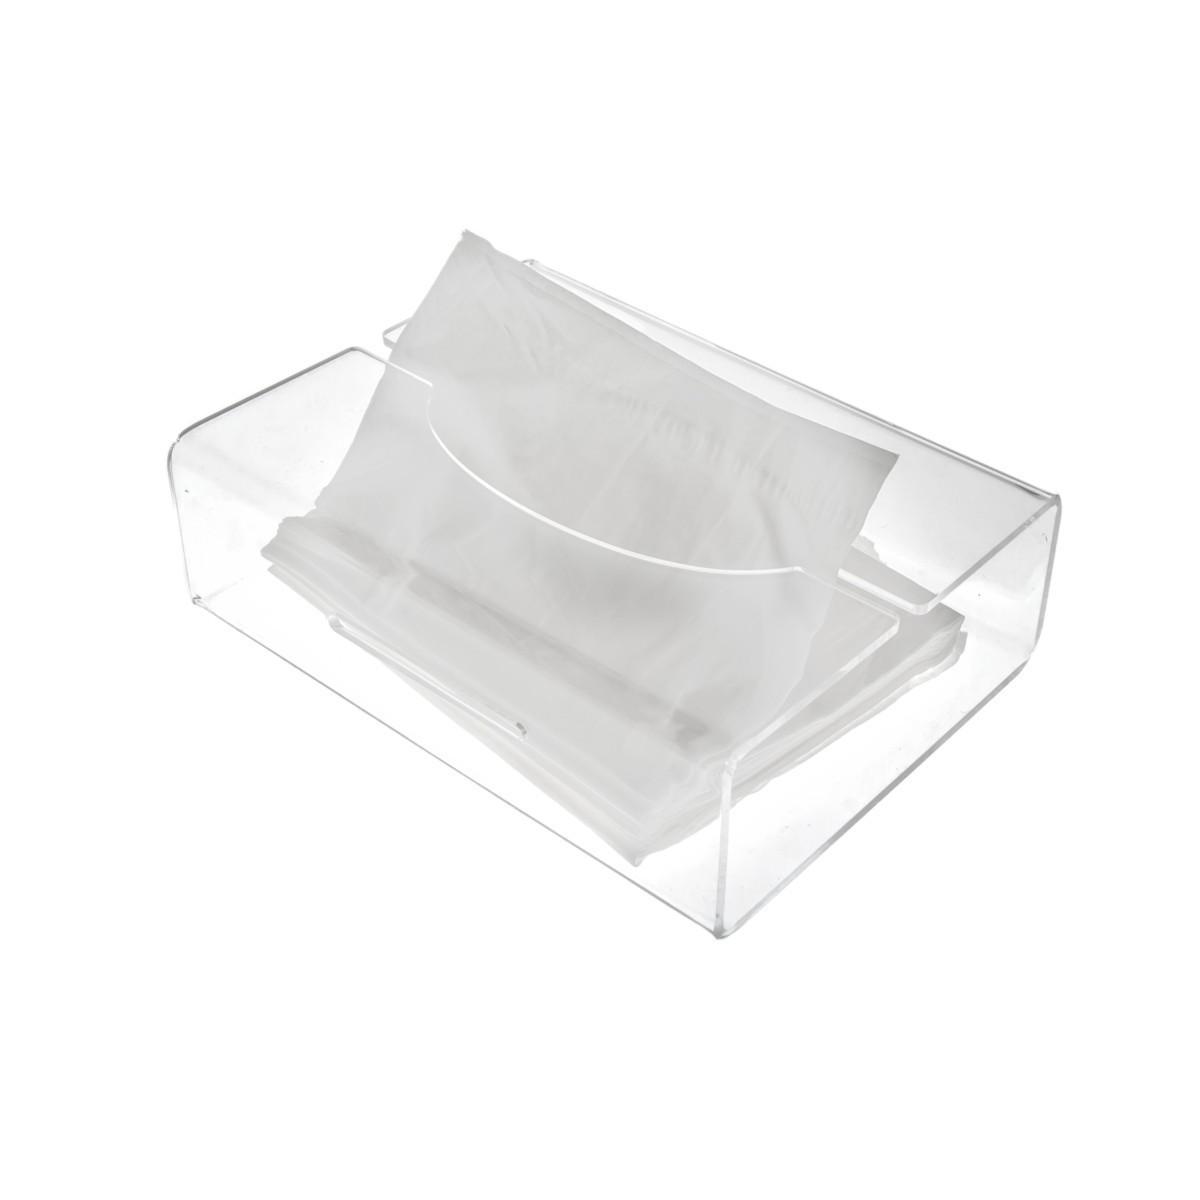 E-124 PKL-B - Porta kleenex in plexiglass trasparente - Misura: 23x13x H6 cm